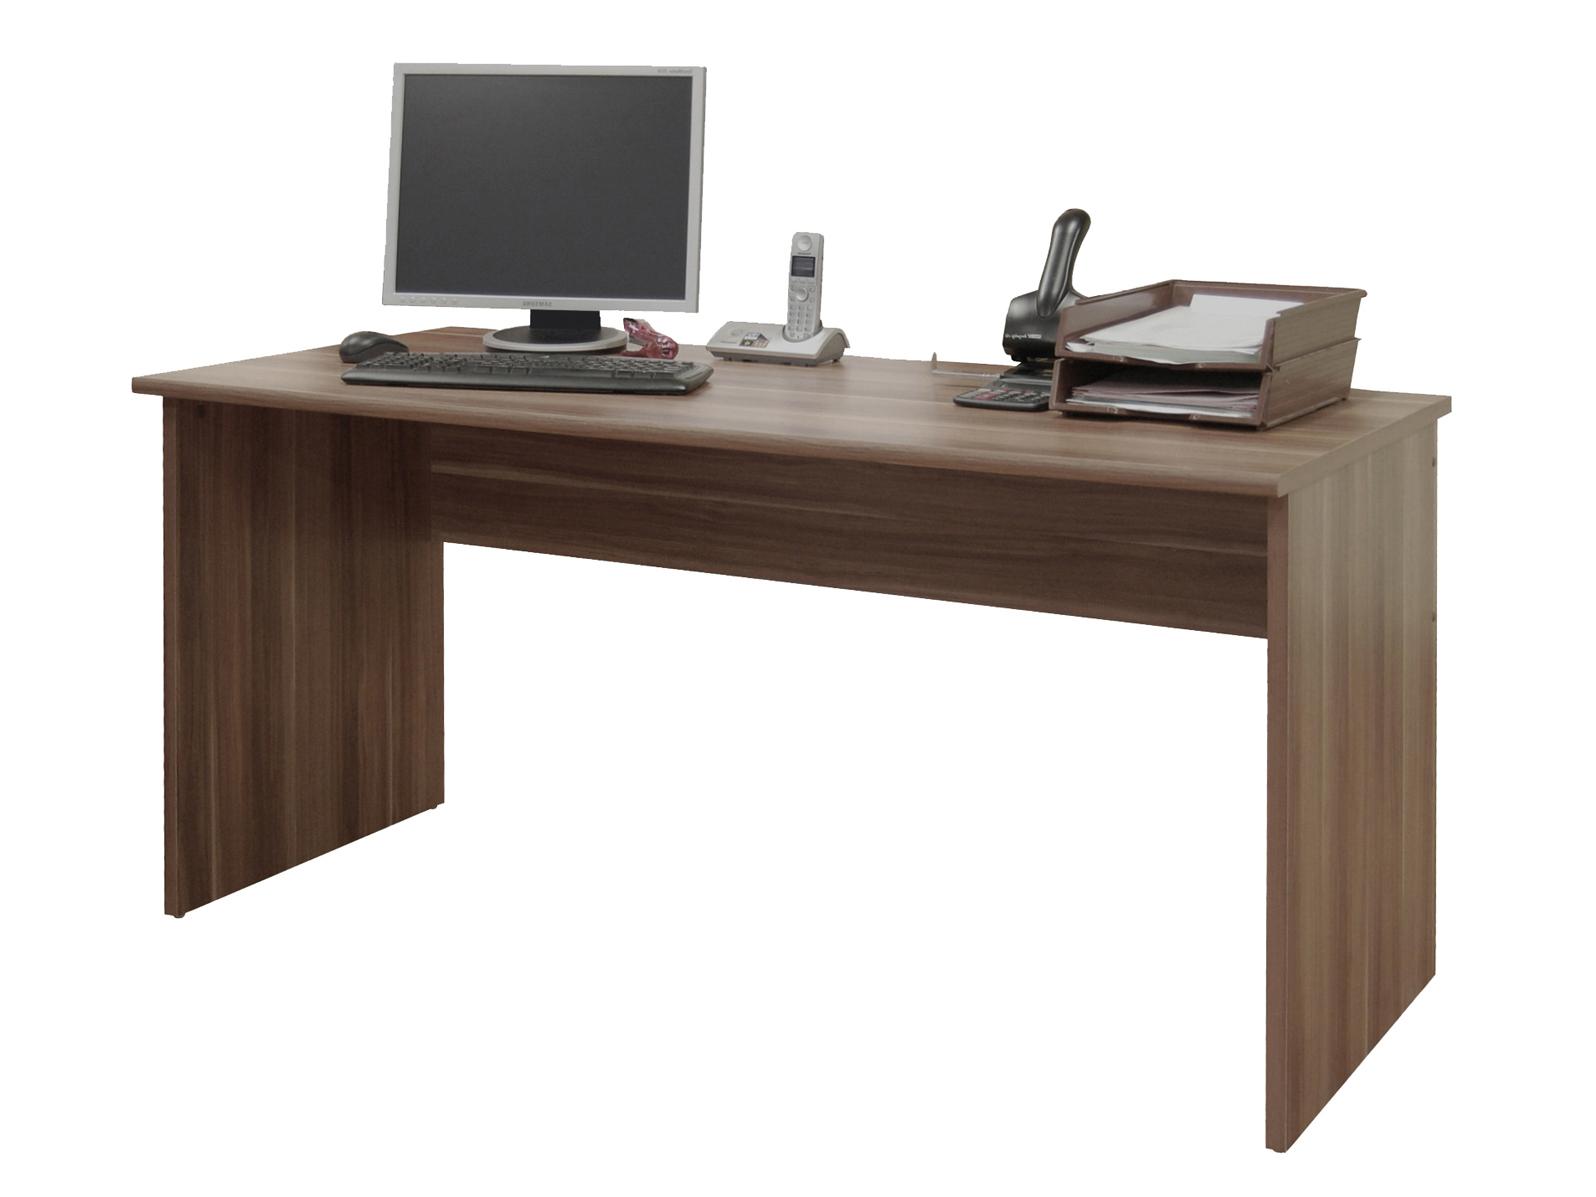 d3d30105eaa4b Písací stôl Johan 01 | NovýNábytok.sk